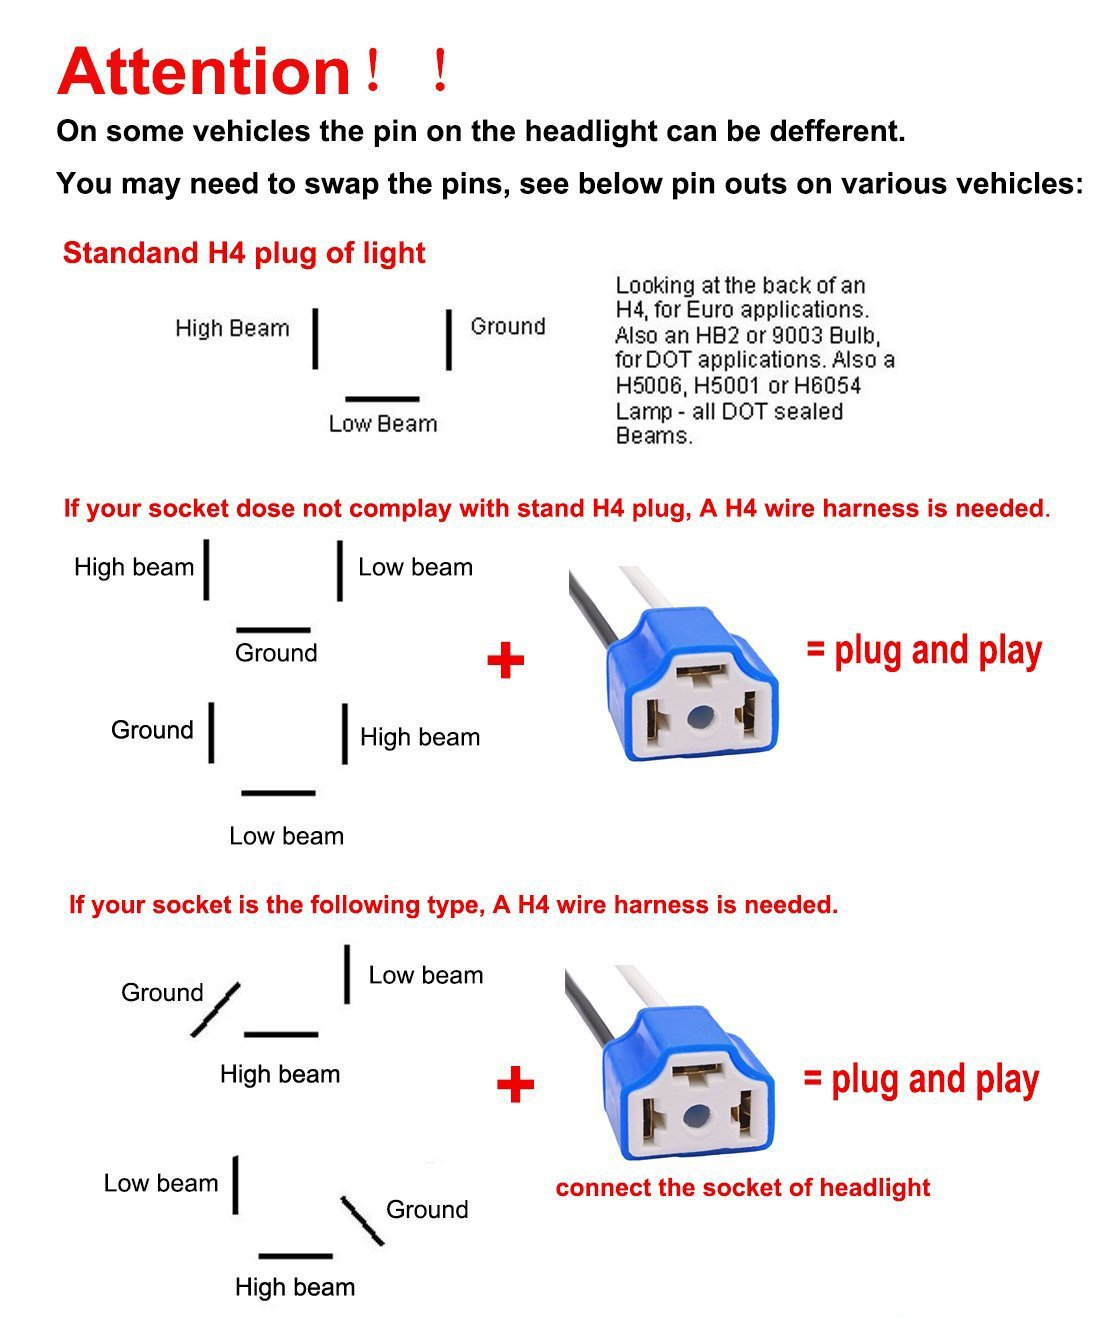 H6054 Bulb Wiring Diagram | Wiring Schematic Diagram - 16 ... on